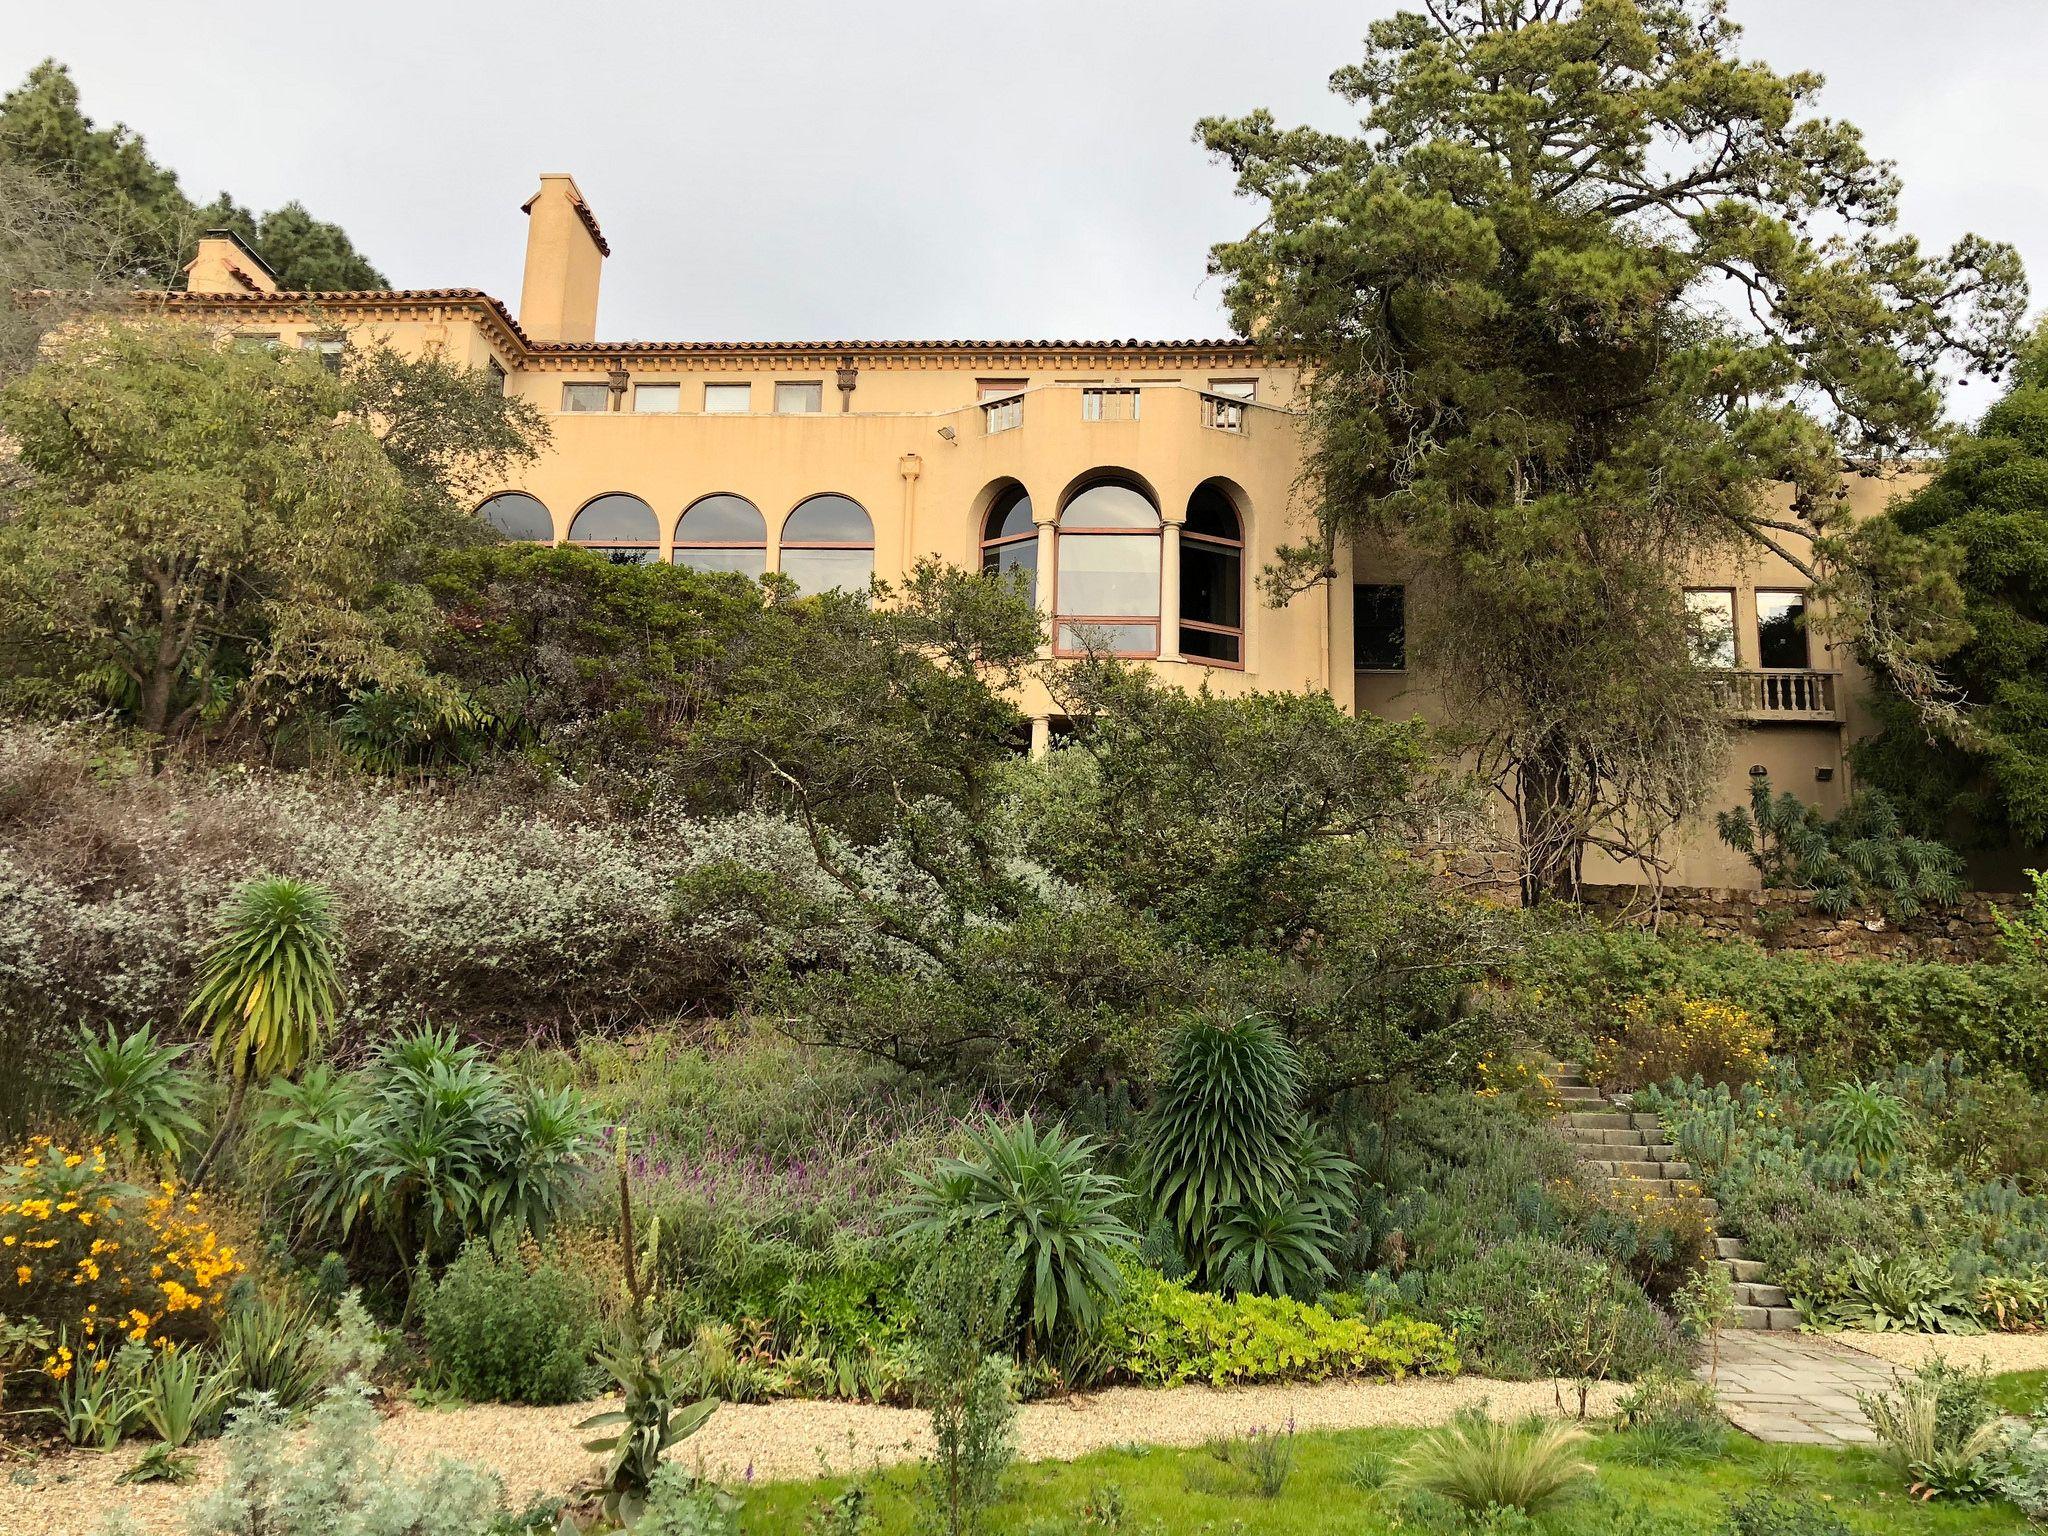 Blake House & Garden | Berkeley, California - My Home Town ...